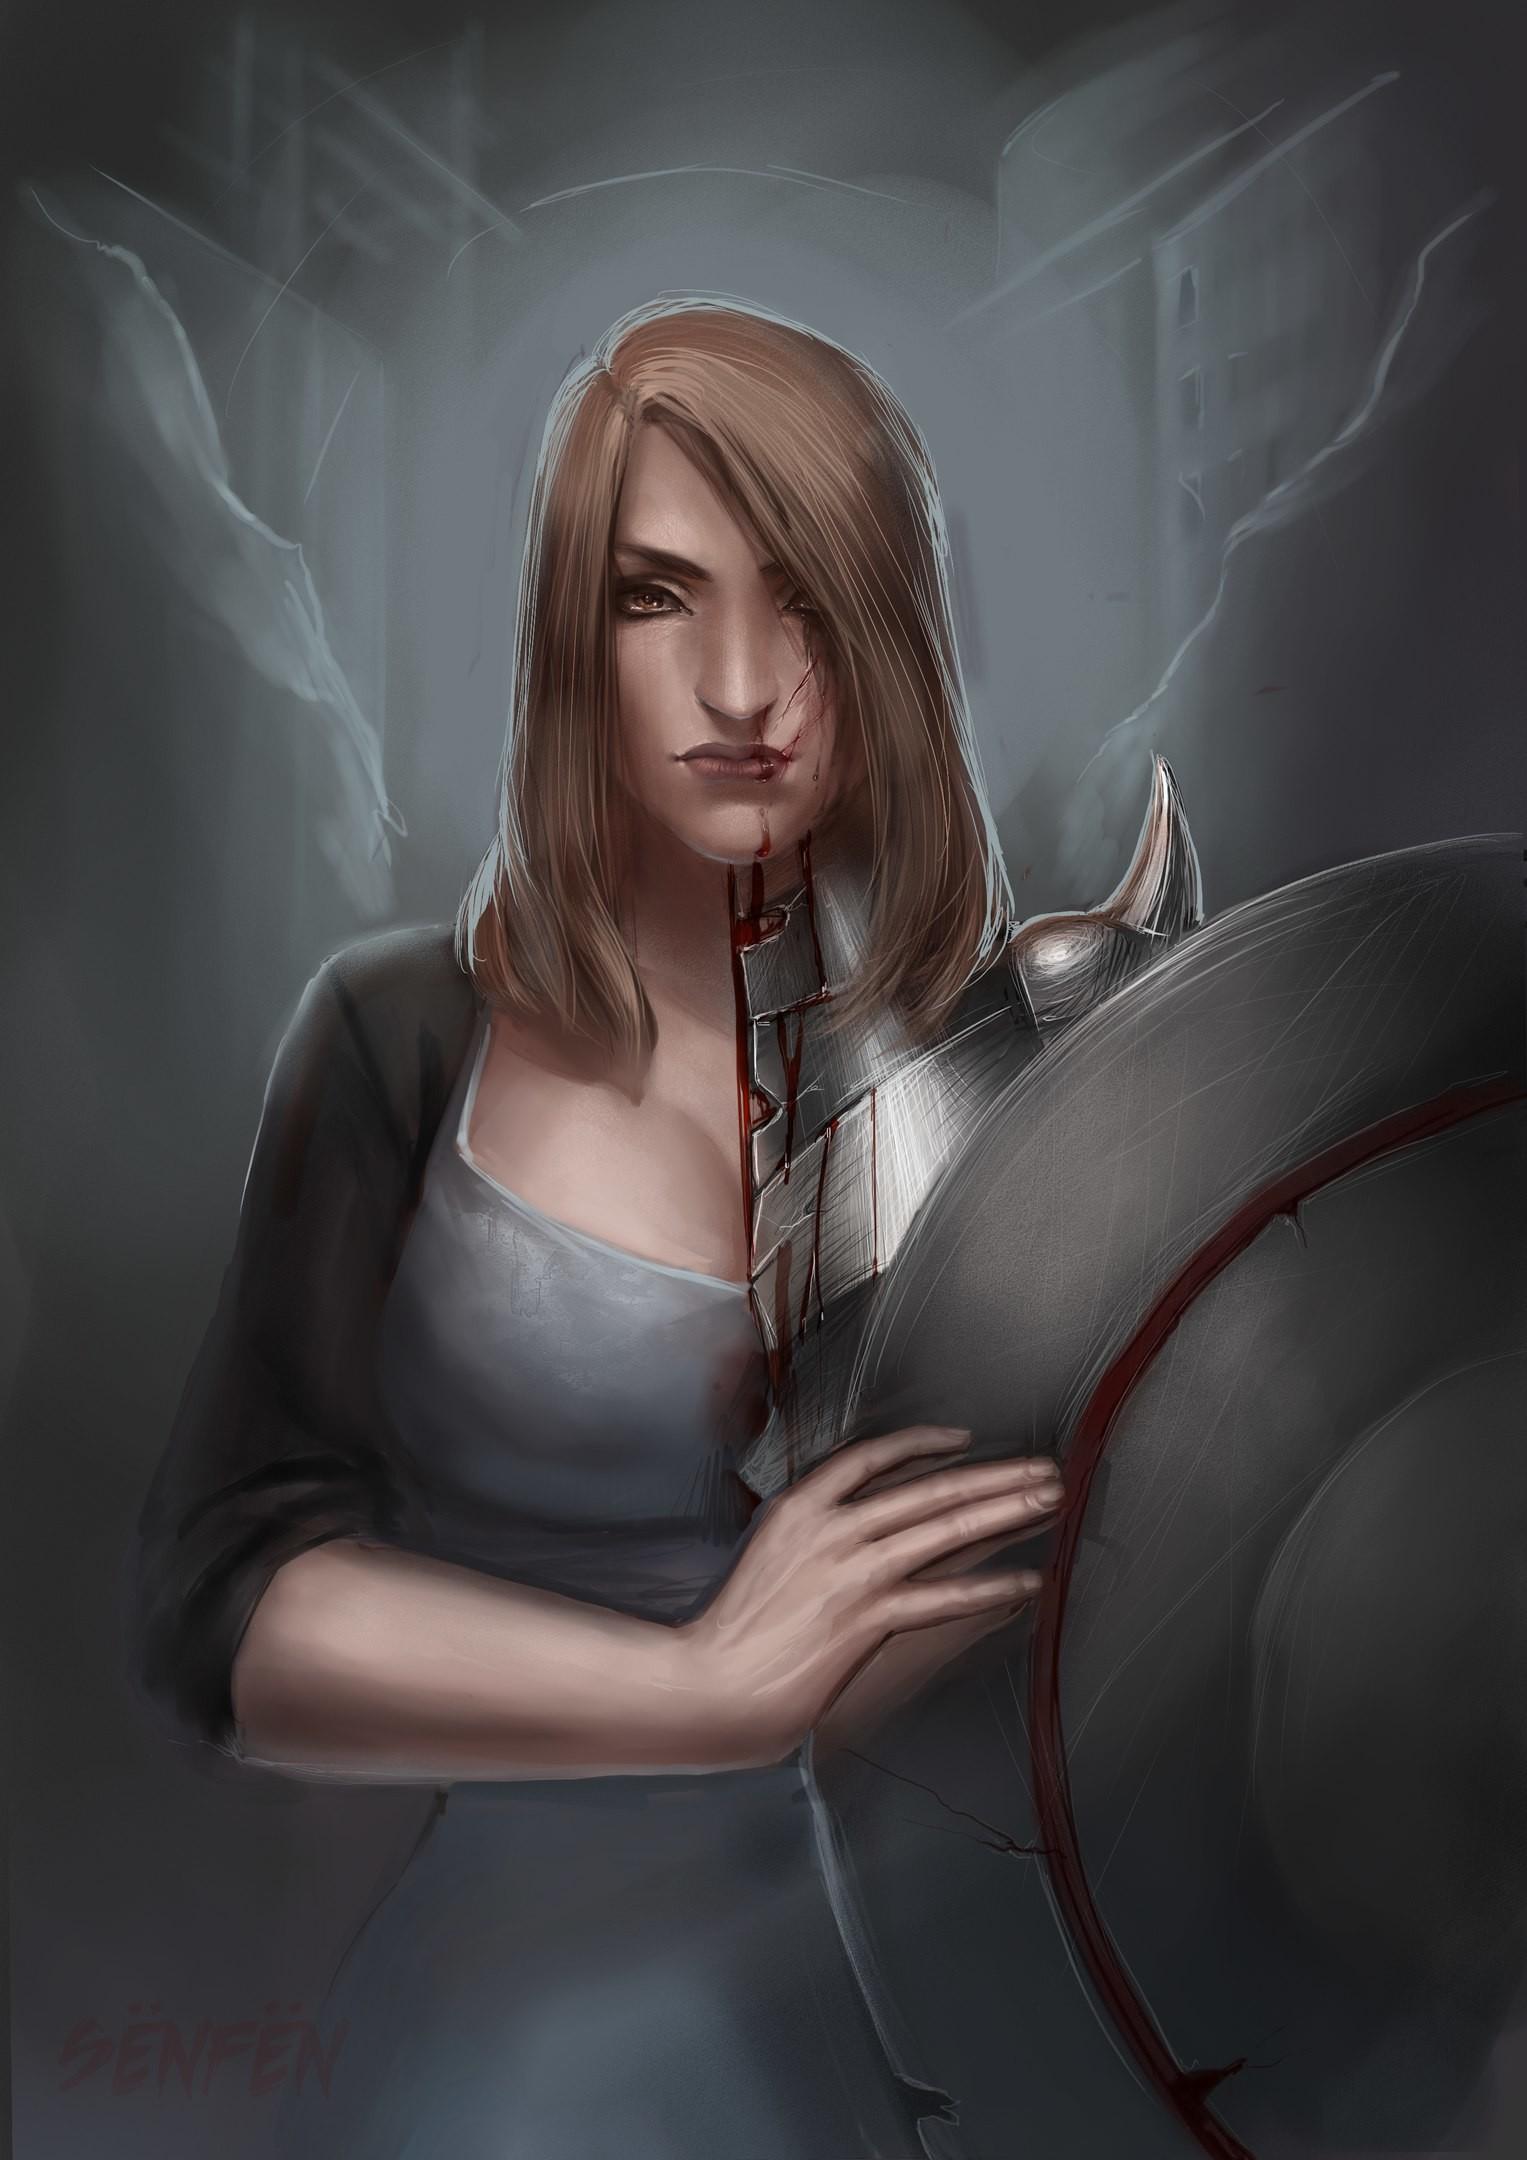 Polina aleksashenko kjaj6yzq72c 1